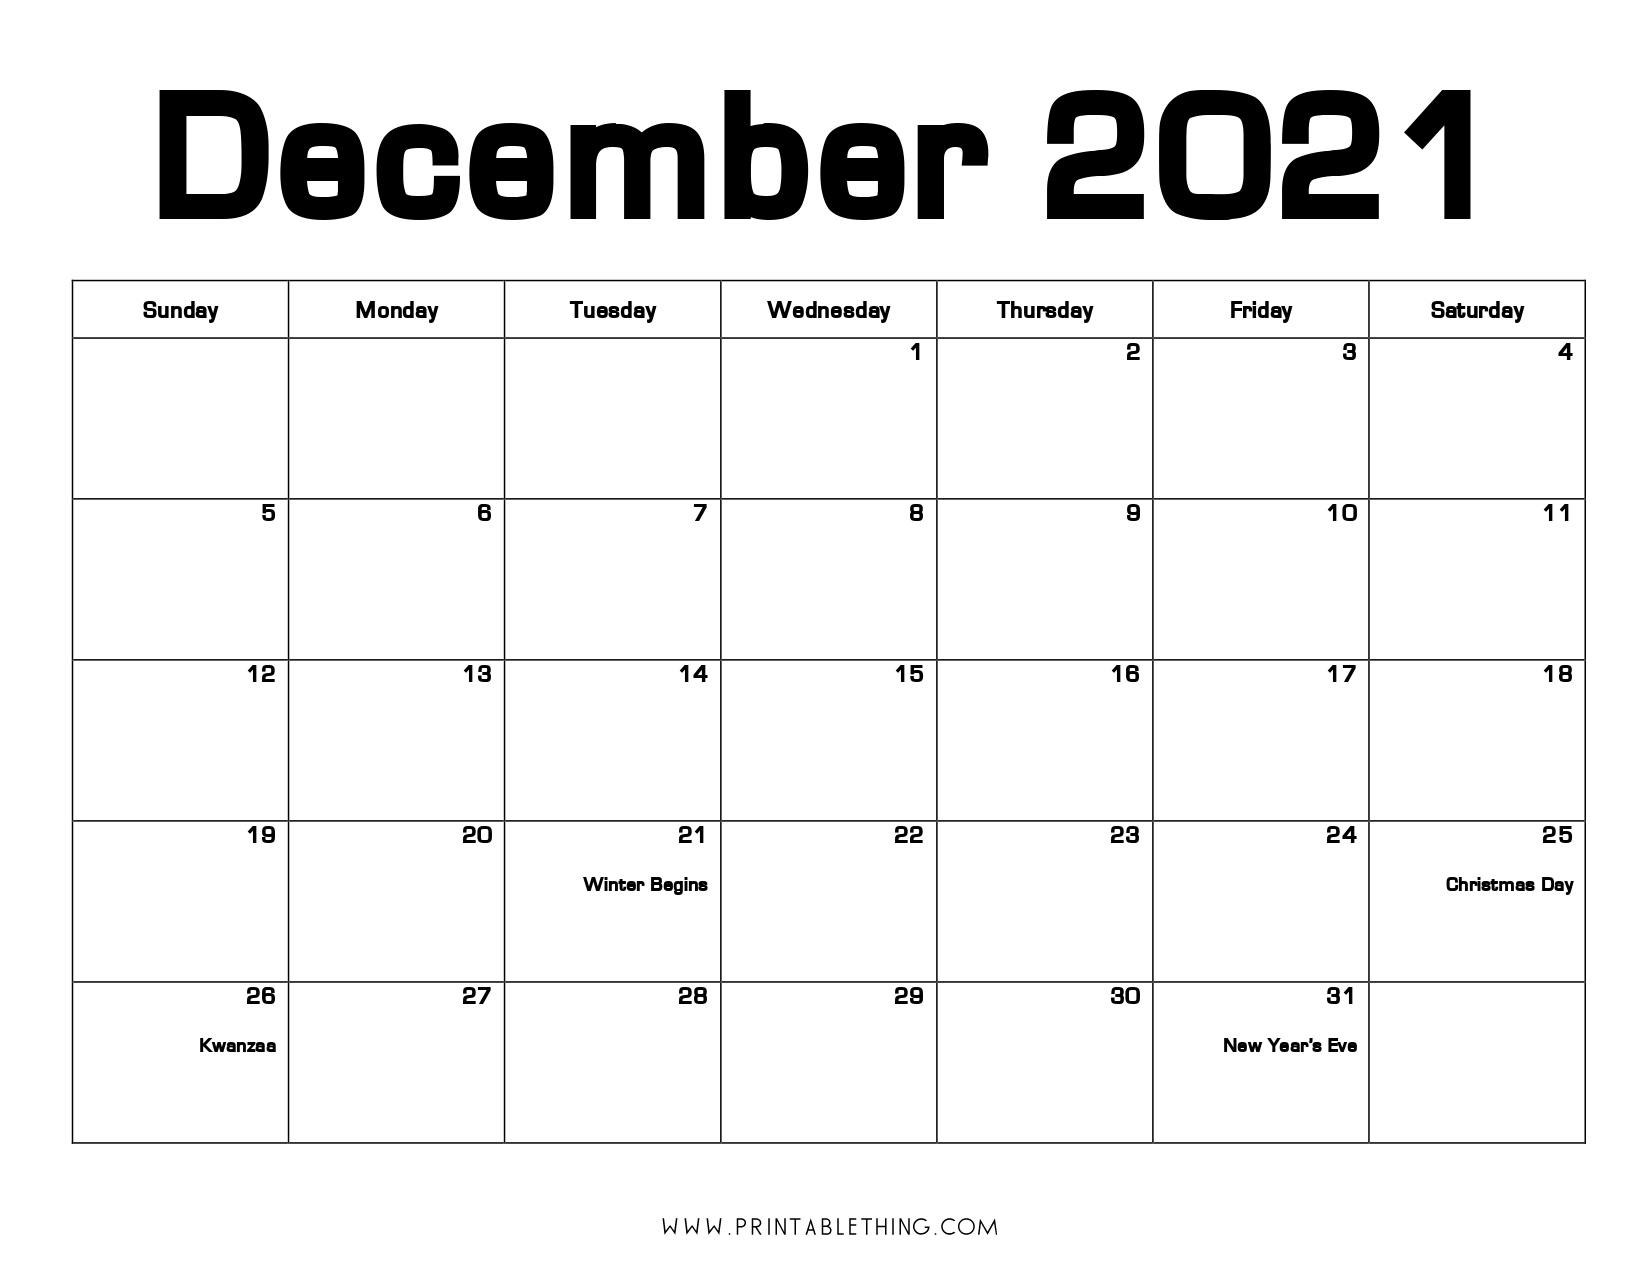 December 2021 Calendar Pdf, December 2021 Calendar Image Print December 2021 Calendar Printable